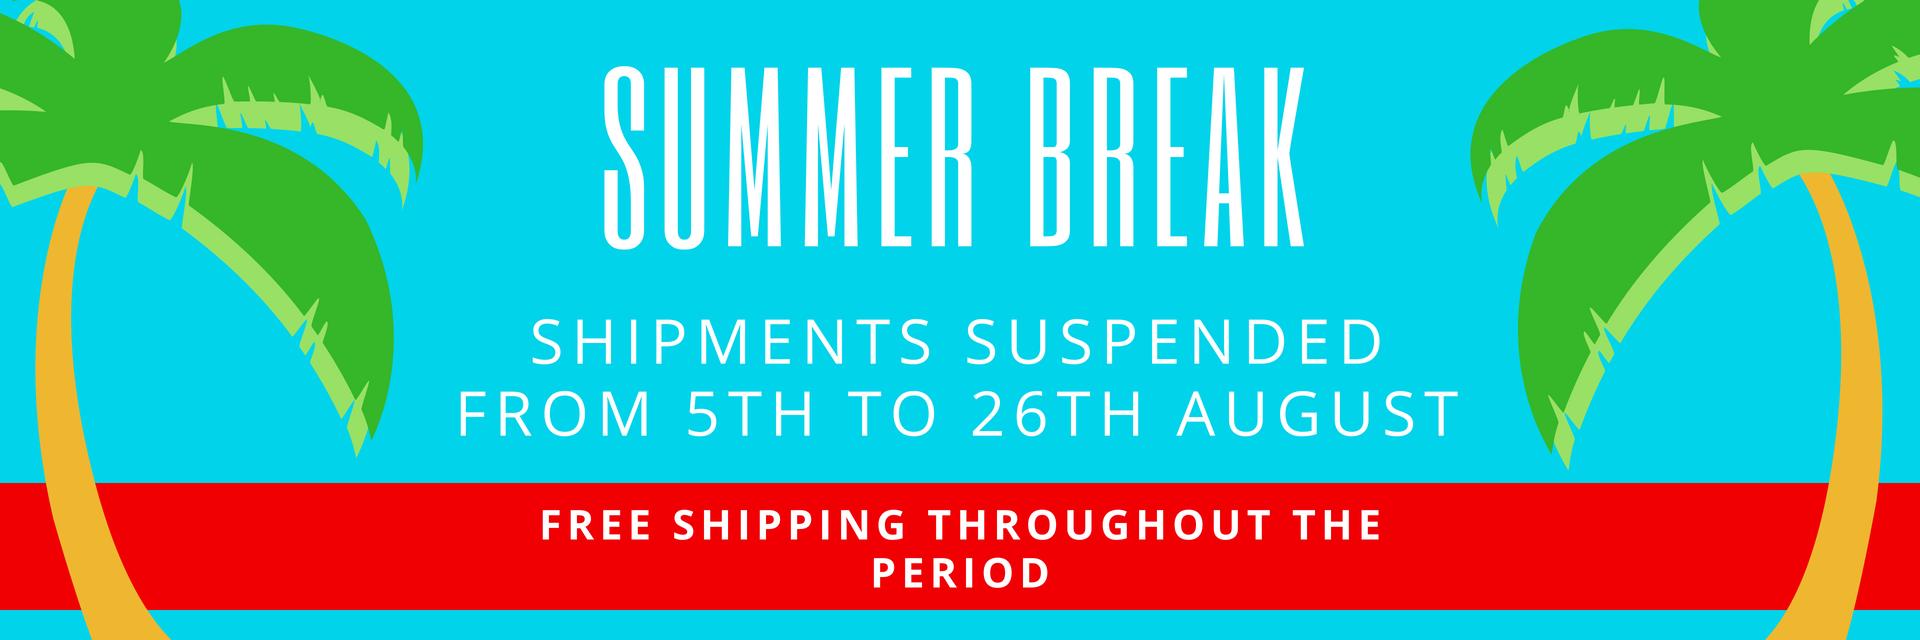 free shipping summer break